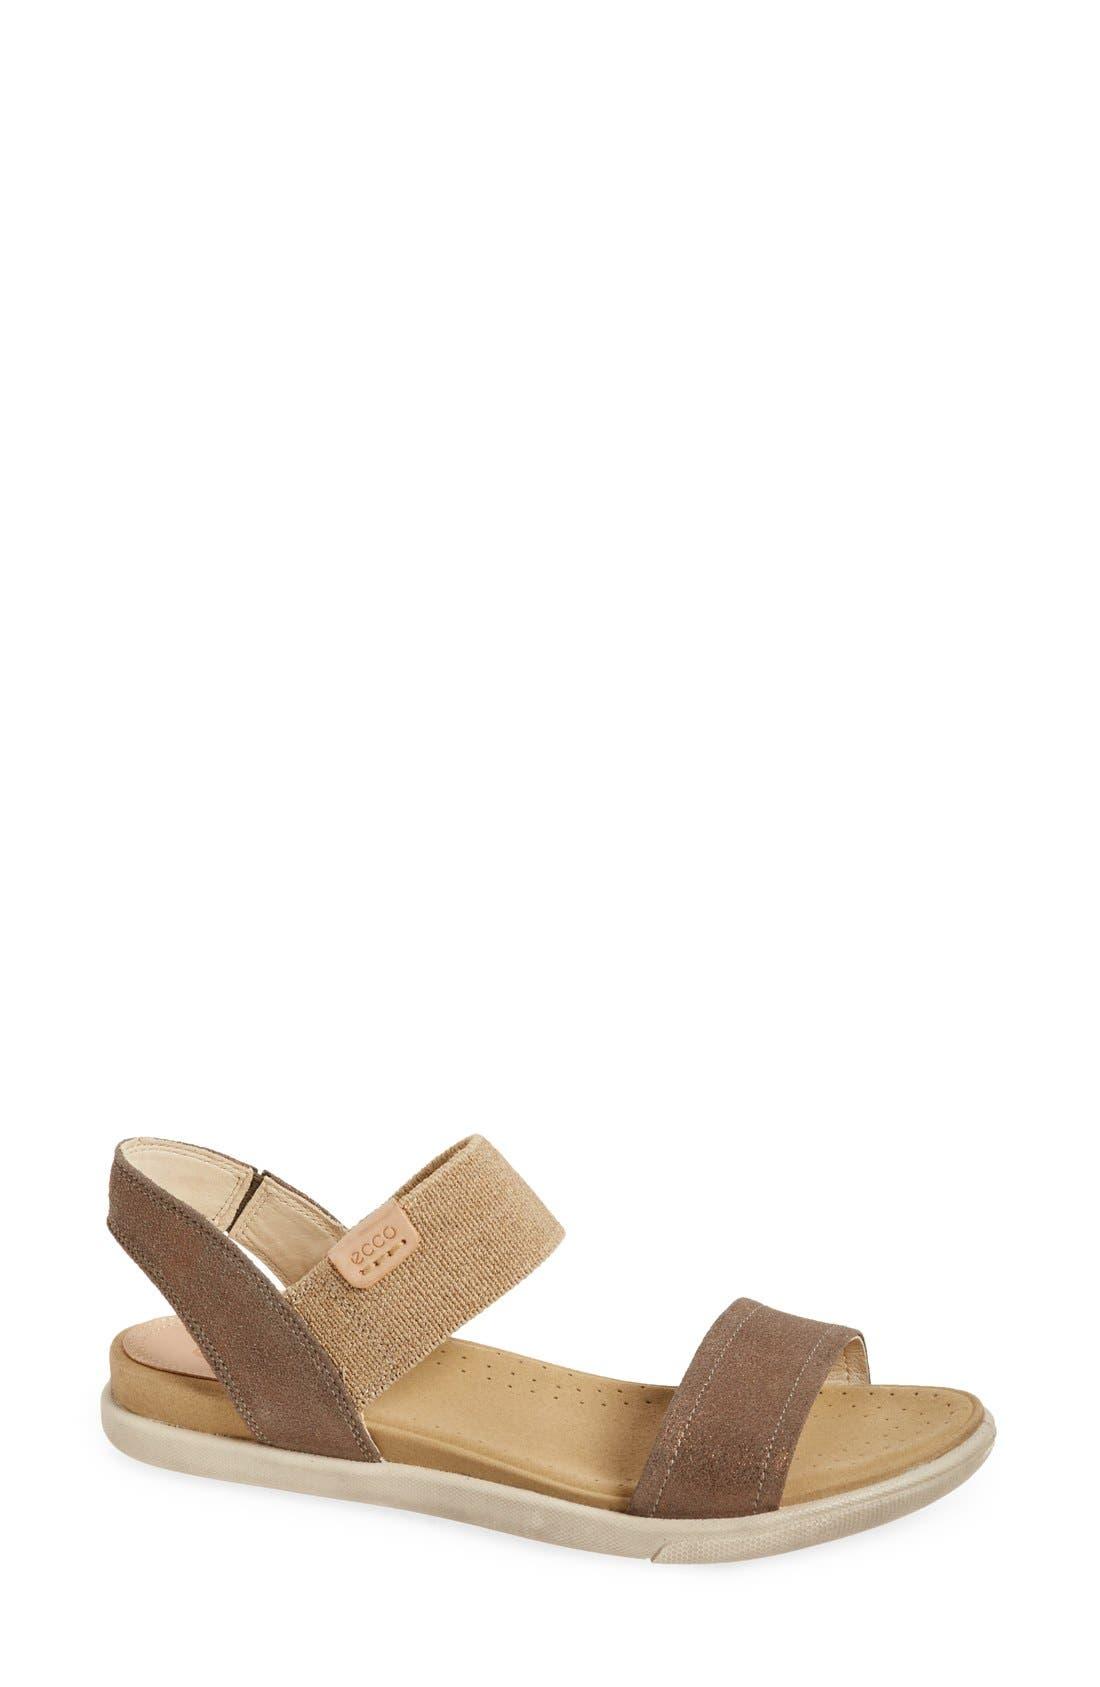 'Damara' Strap Sandal,                             Main thumbnail 3, color,